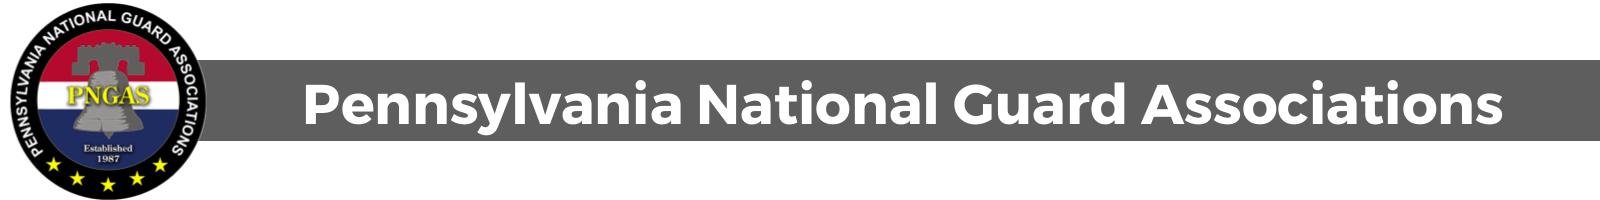 PNGAS Logo